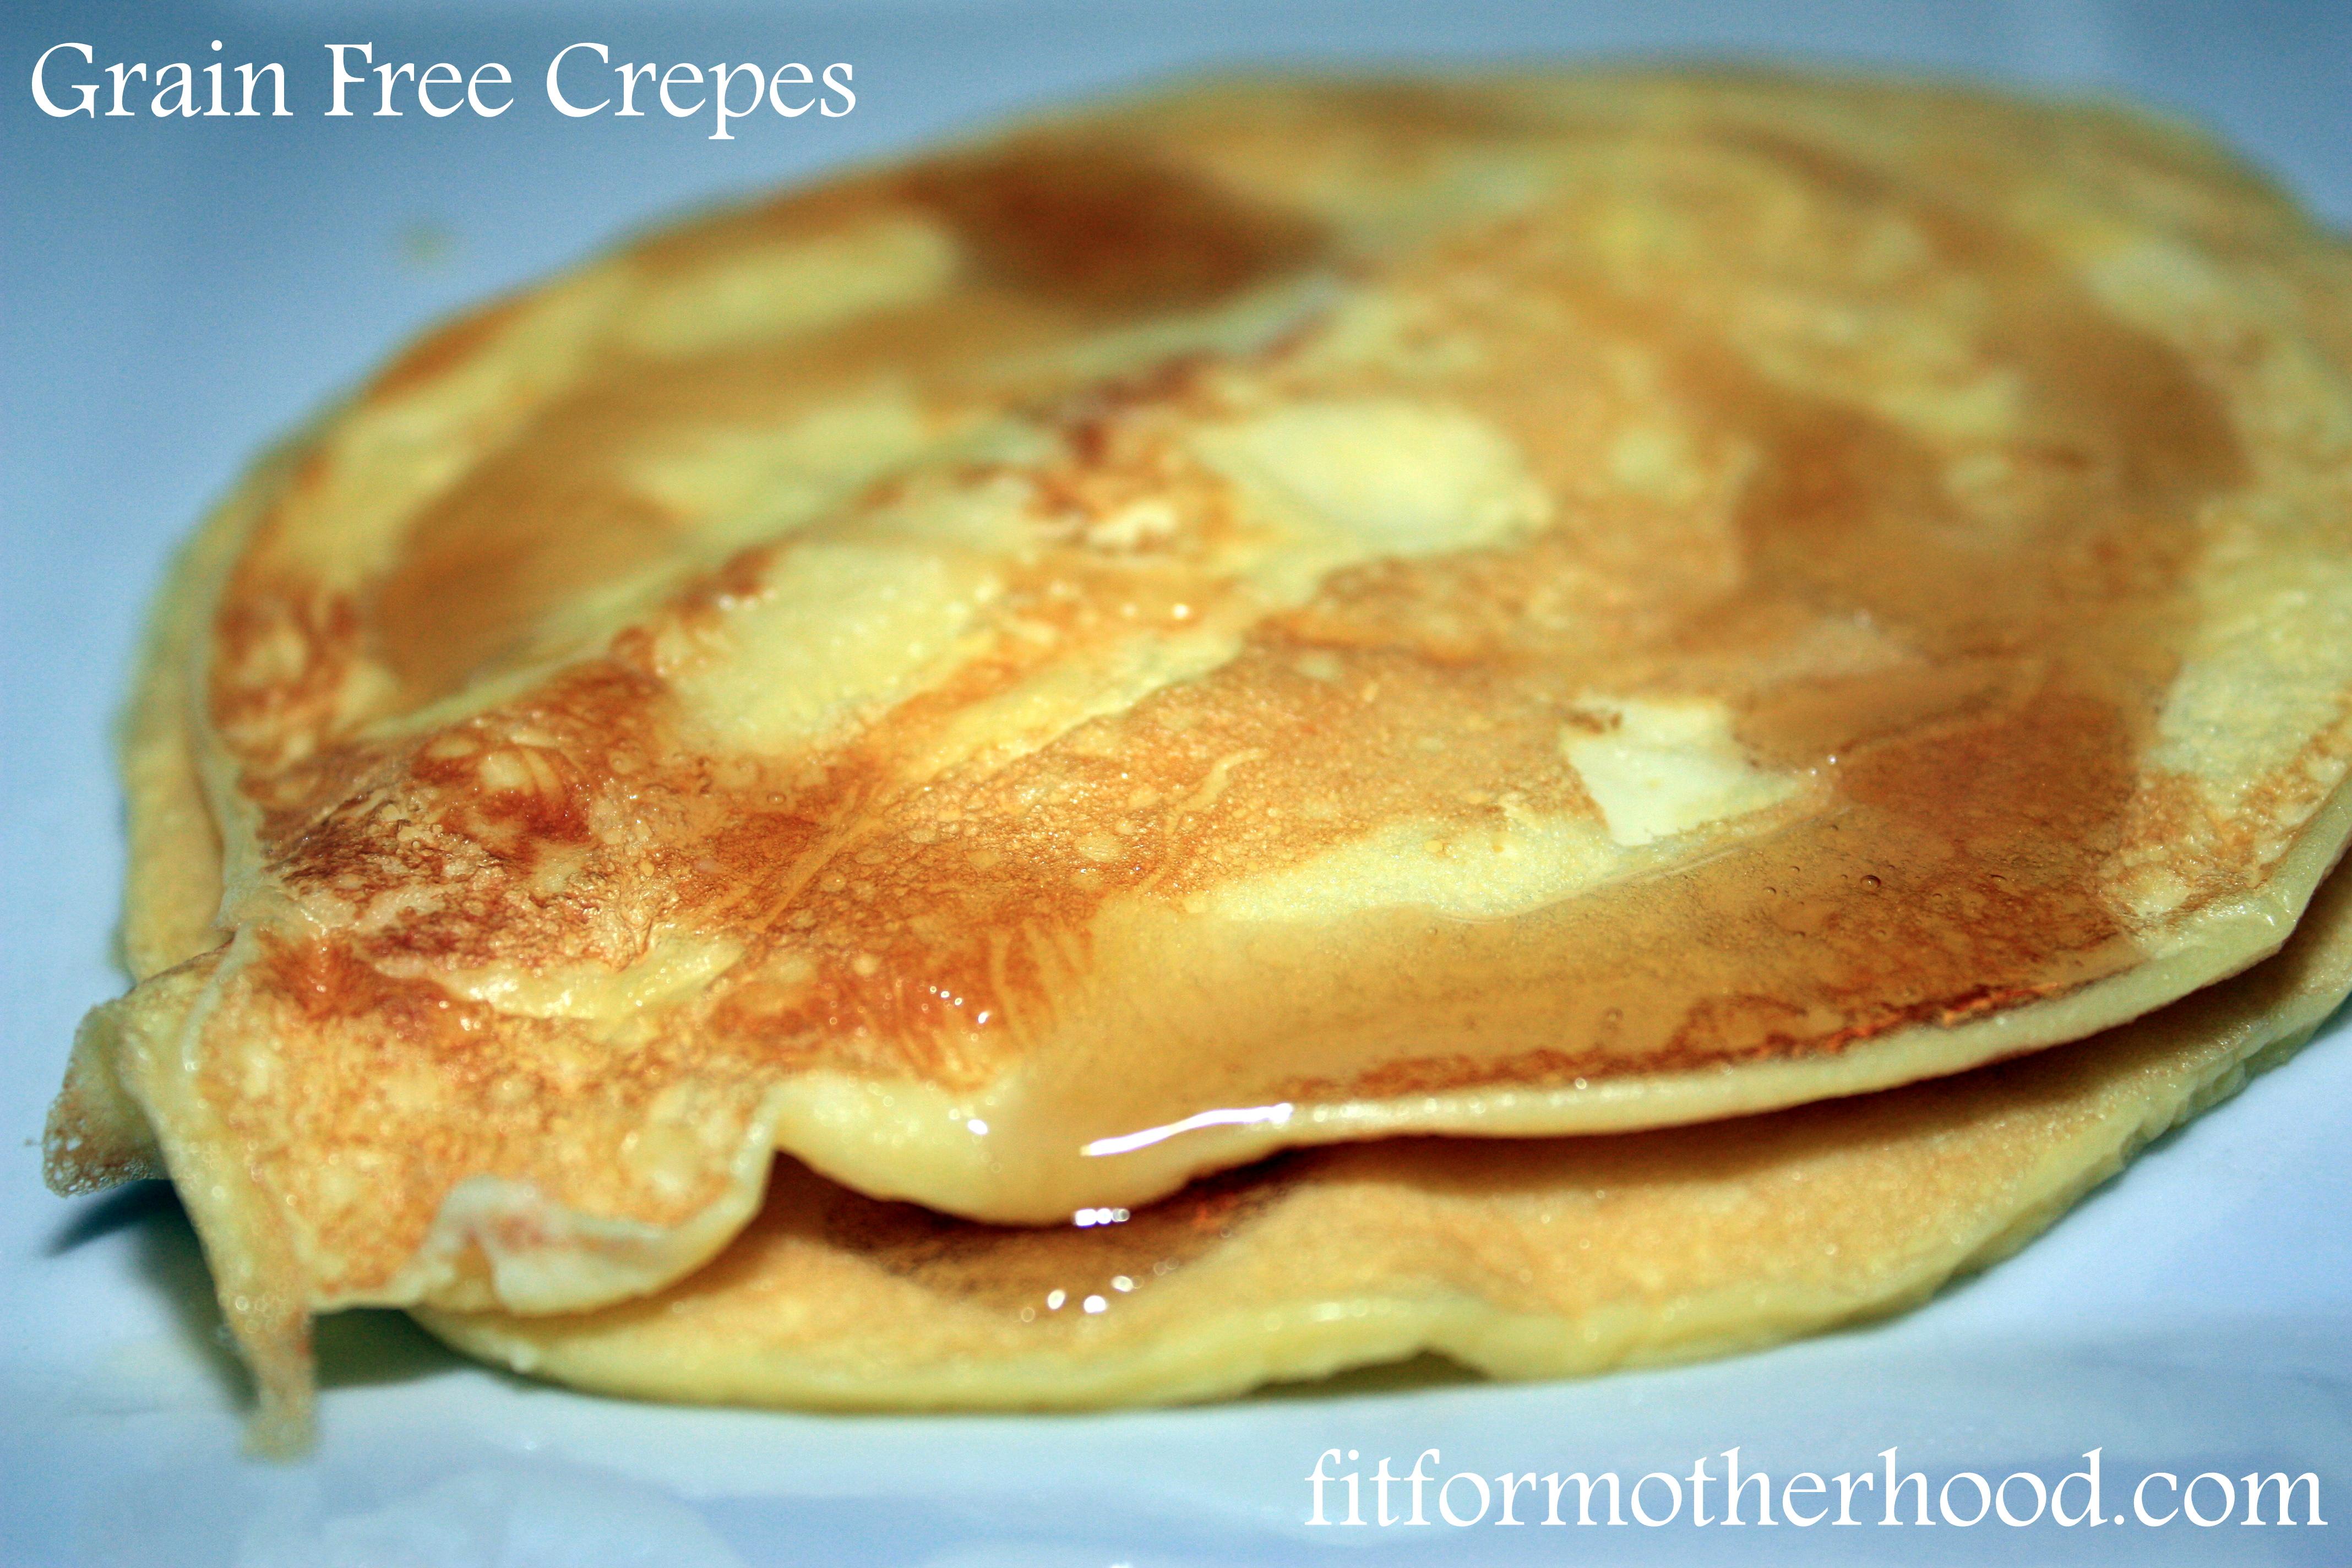 Grain Free Crepes